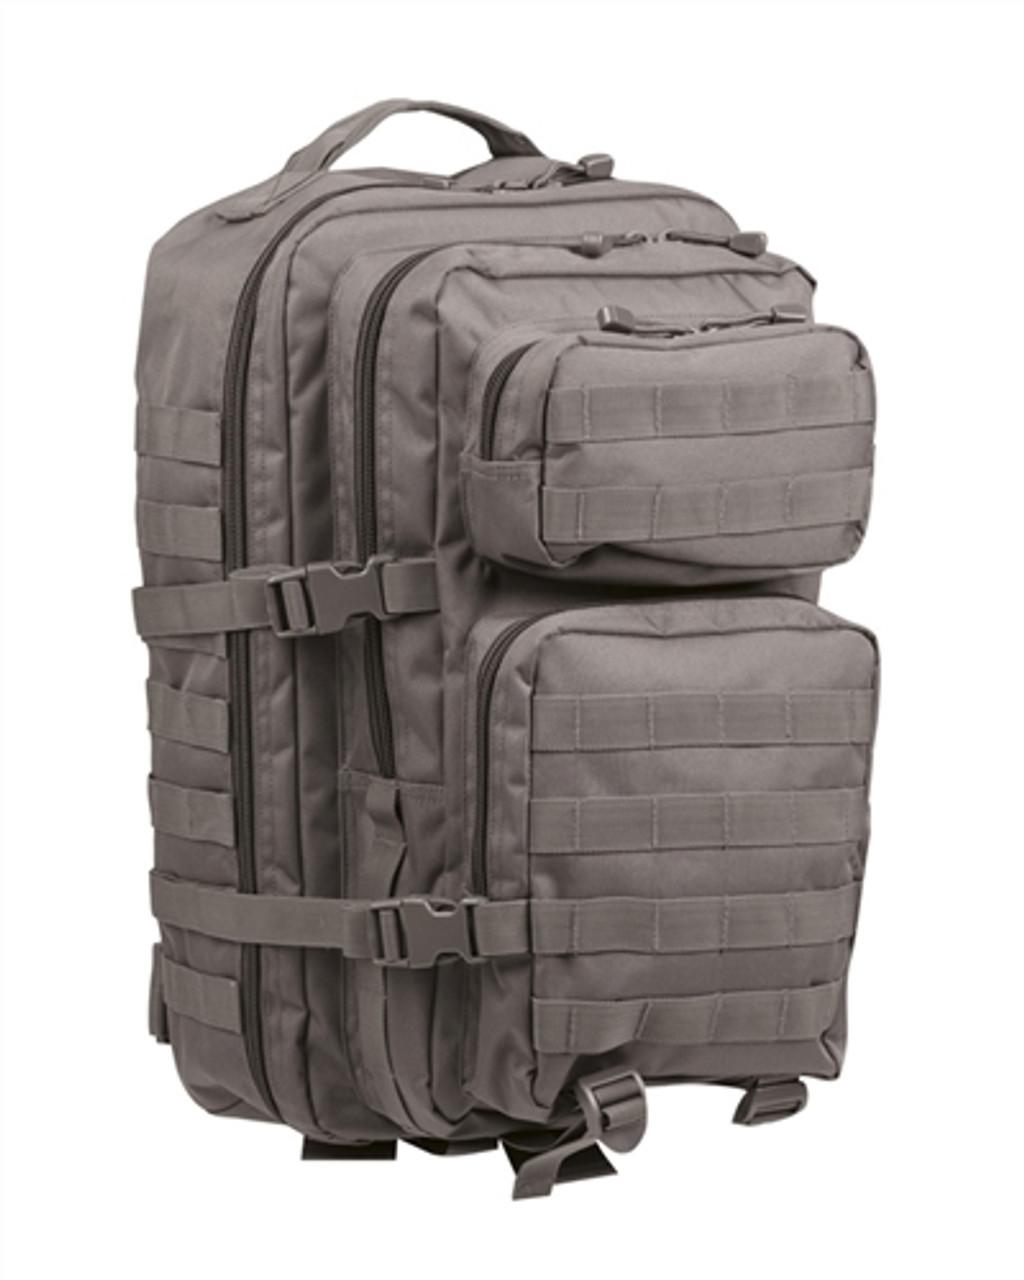 Urban Grey Assault Pack  -  Large Hessen Antique